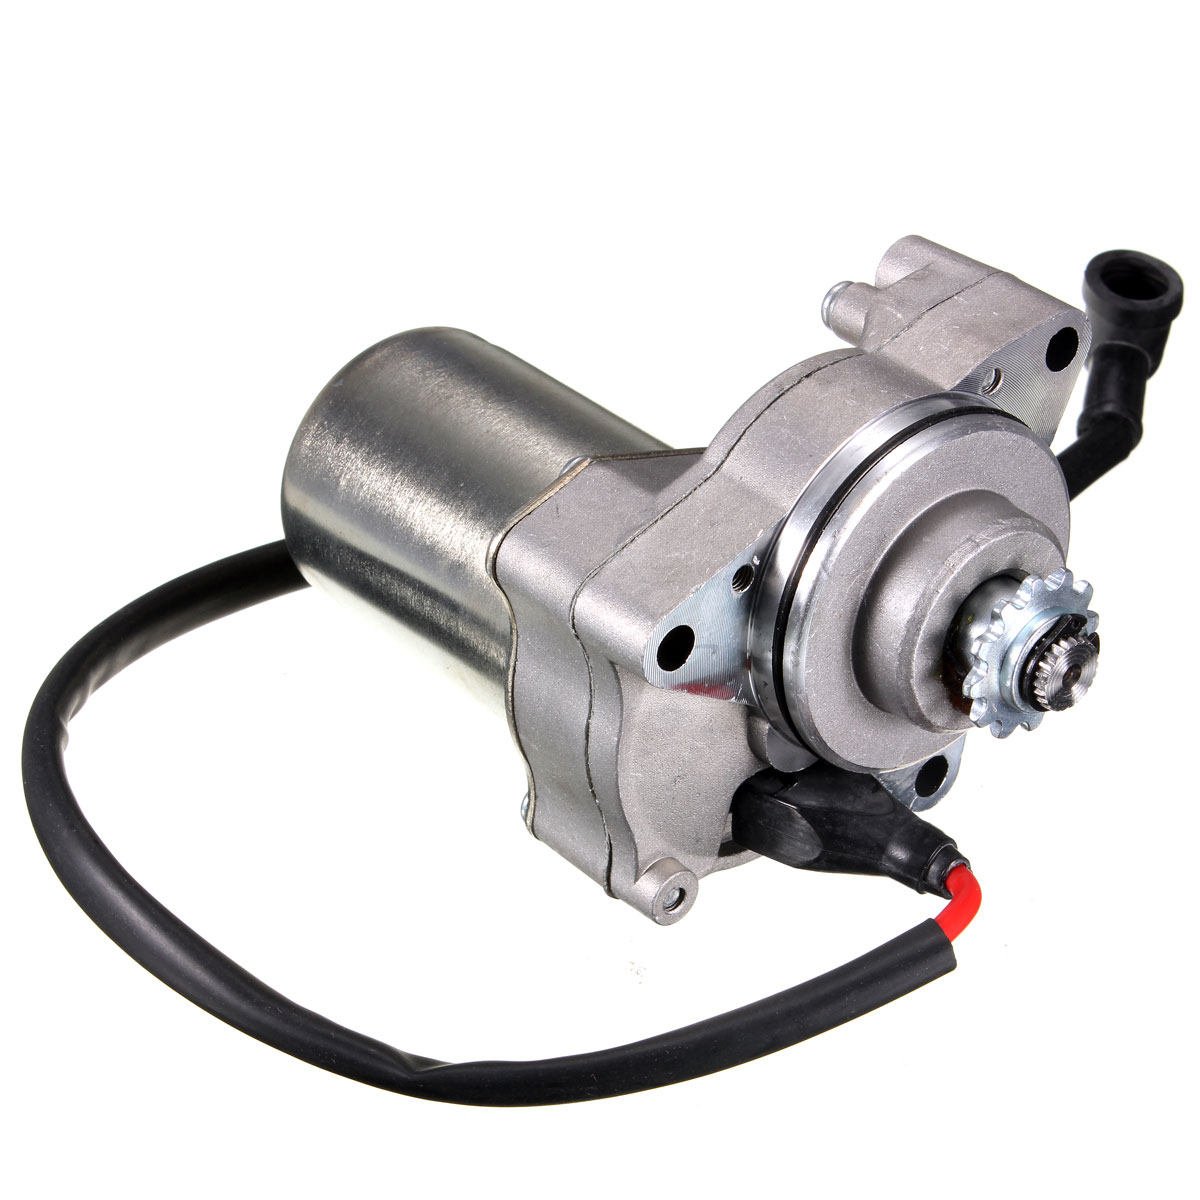 medium resolution of 12v 48v 3 bolt motorbike atv electric starter motor for 50cc 90cc 110cc 4 stroke engine quad atv for honda kawasaki